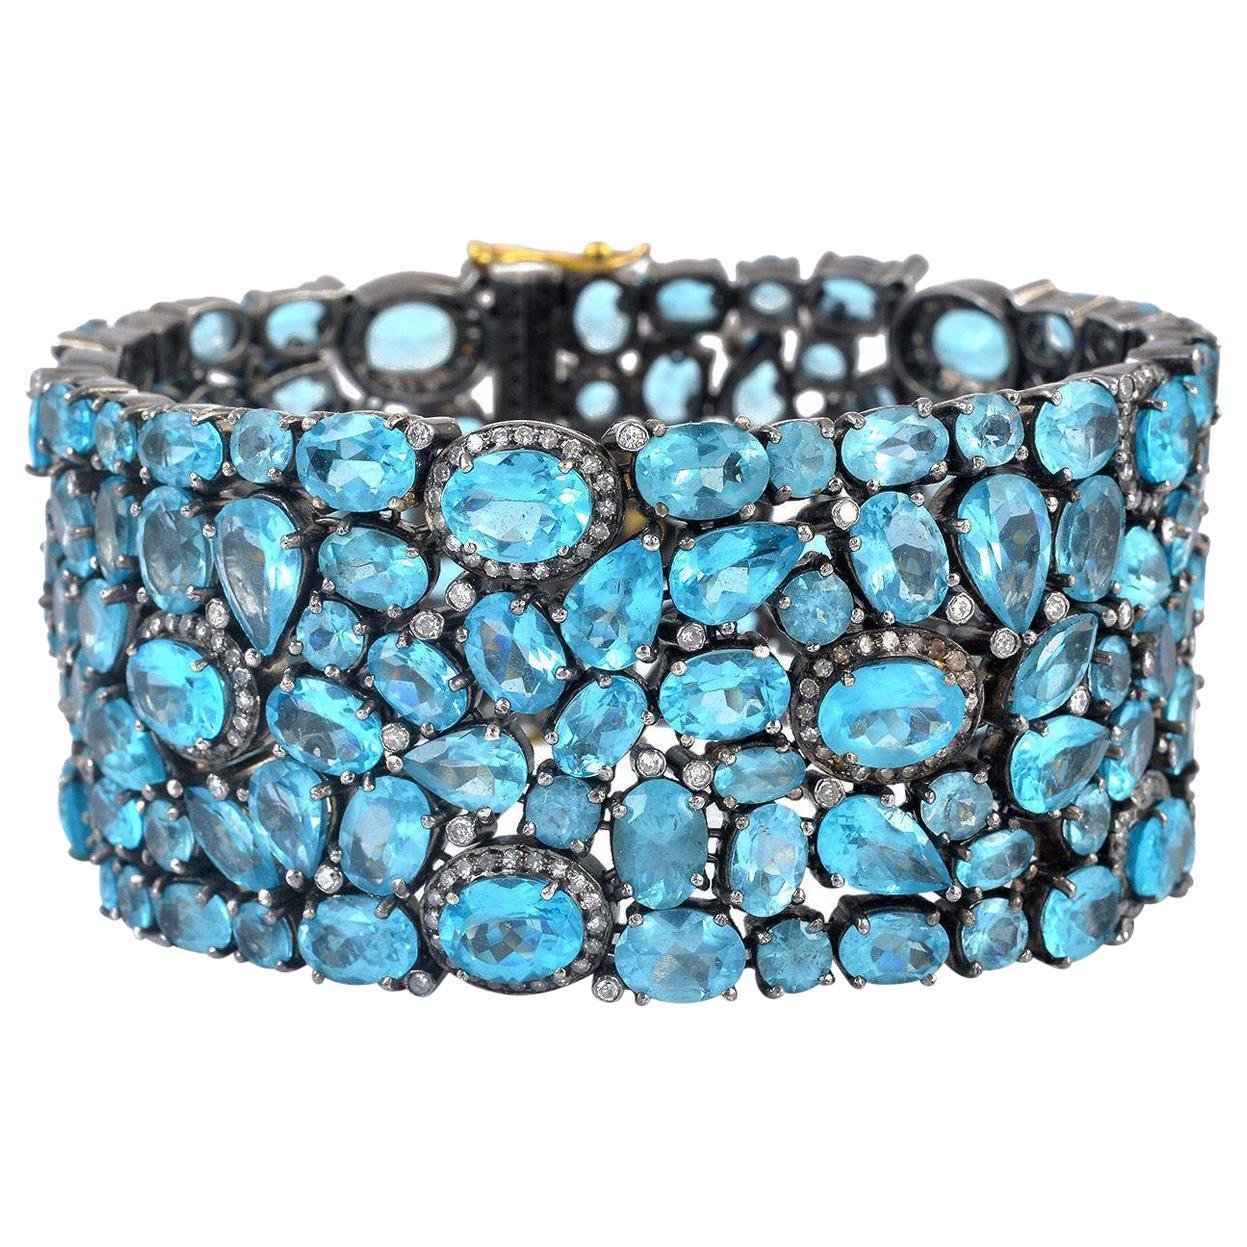 95.1 Carat Apatite Diamond Bracelet